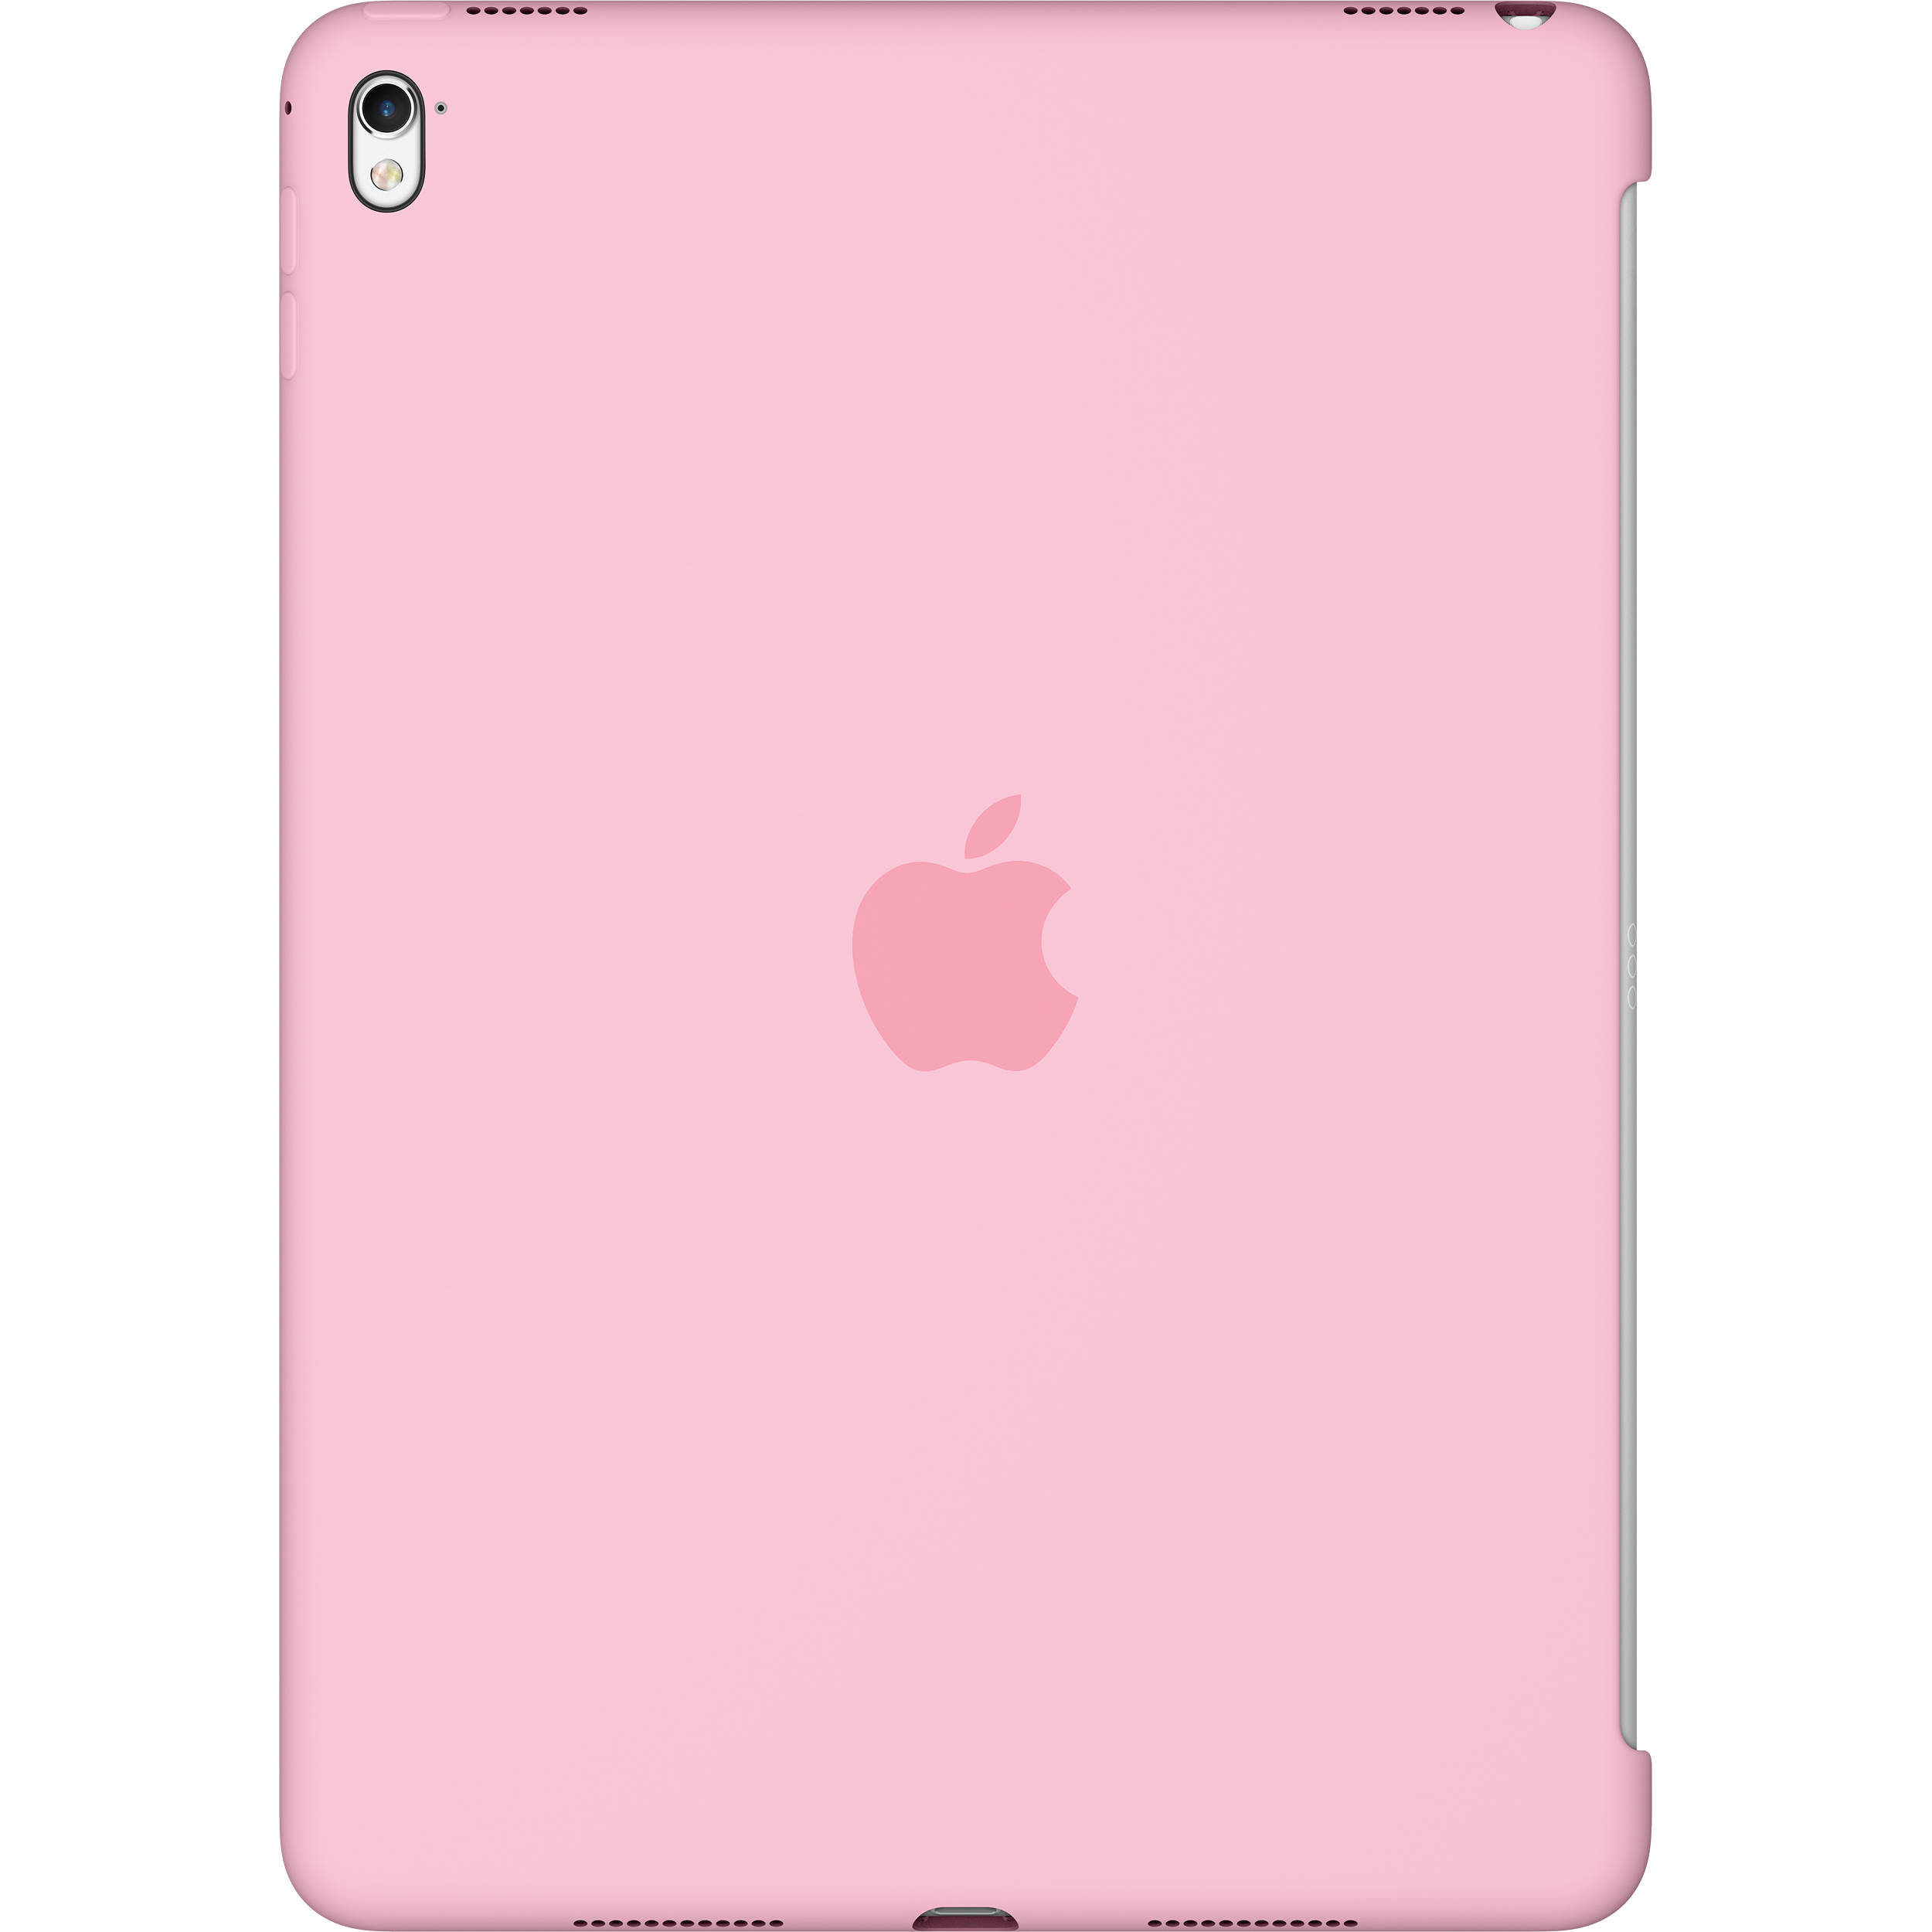 Similiar Pink Bling Ipad Mini Case Keywords Switch Wiring Diagram Iphone Keyboard Paul Kolp